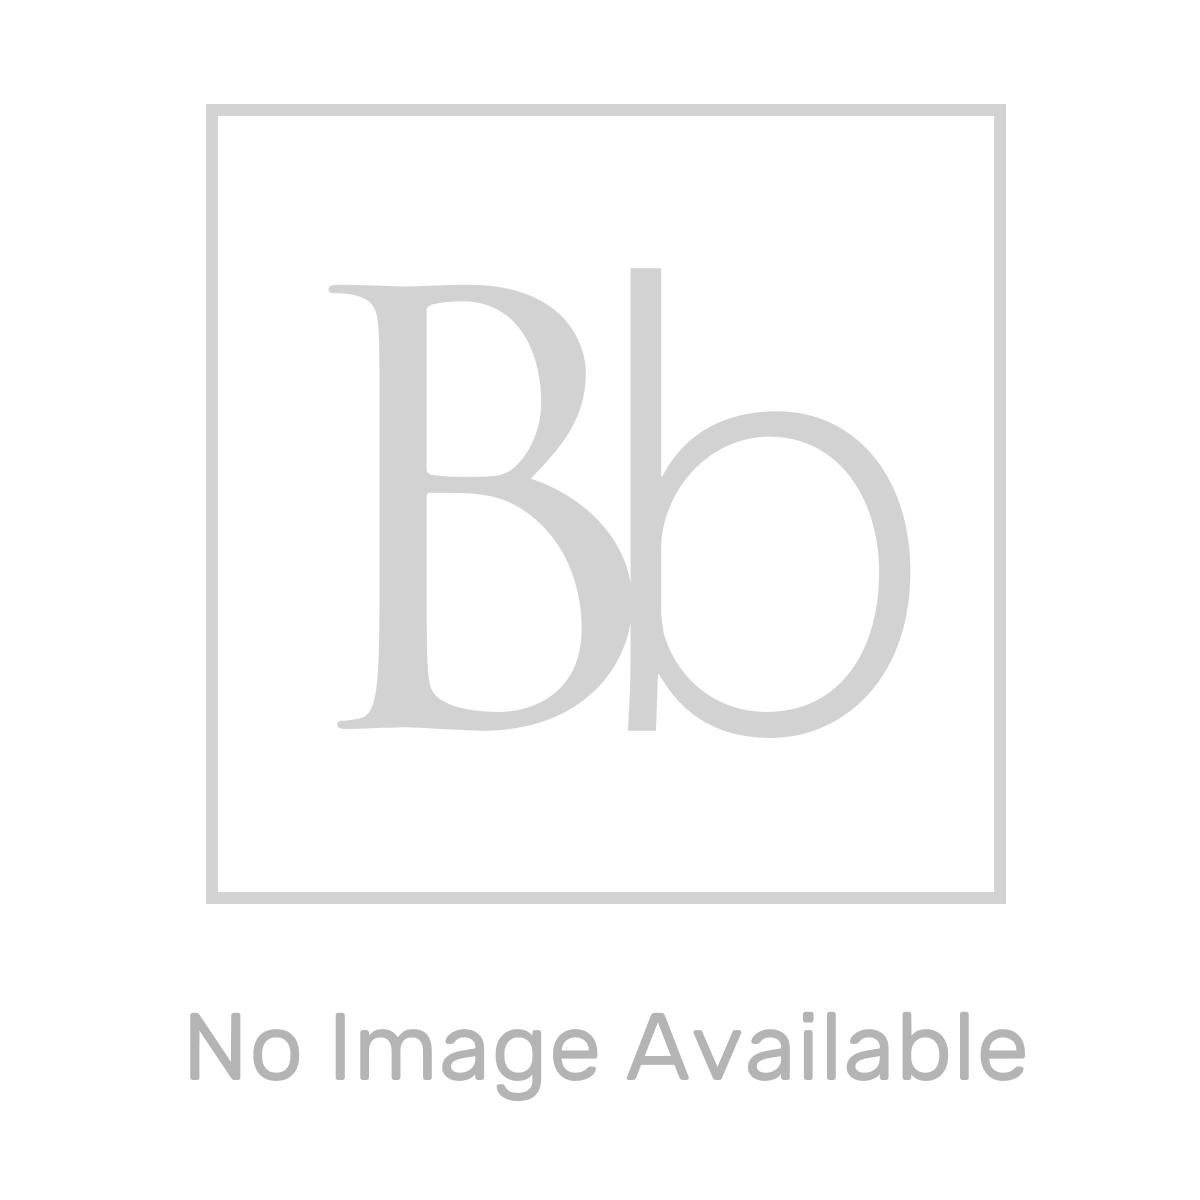 Aquadart Black Slate Shower Tray 1200 x 800